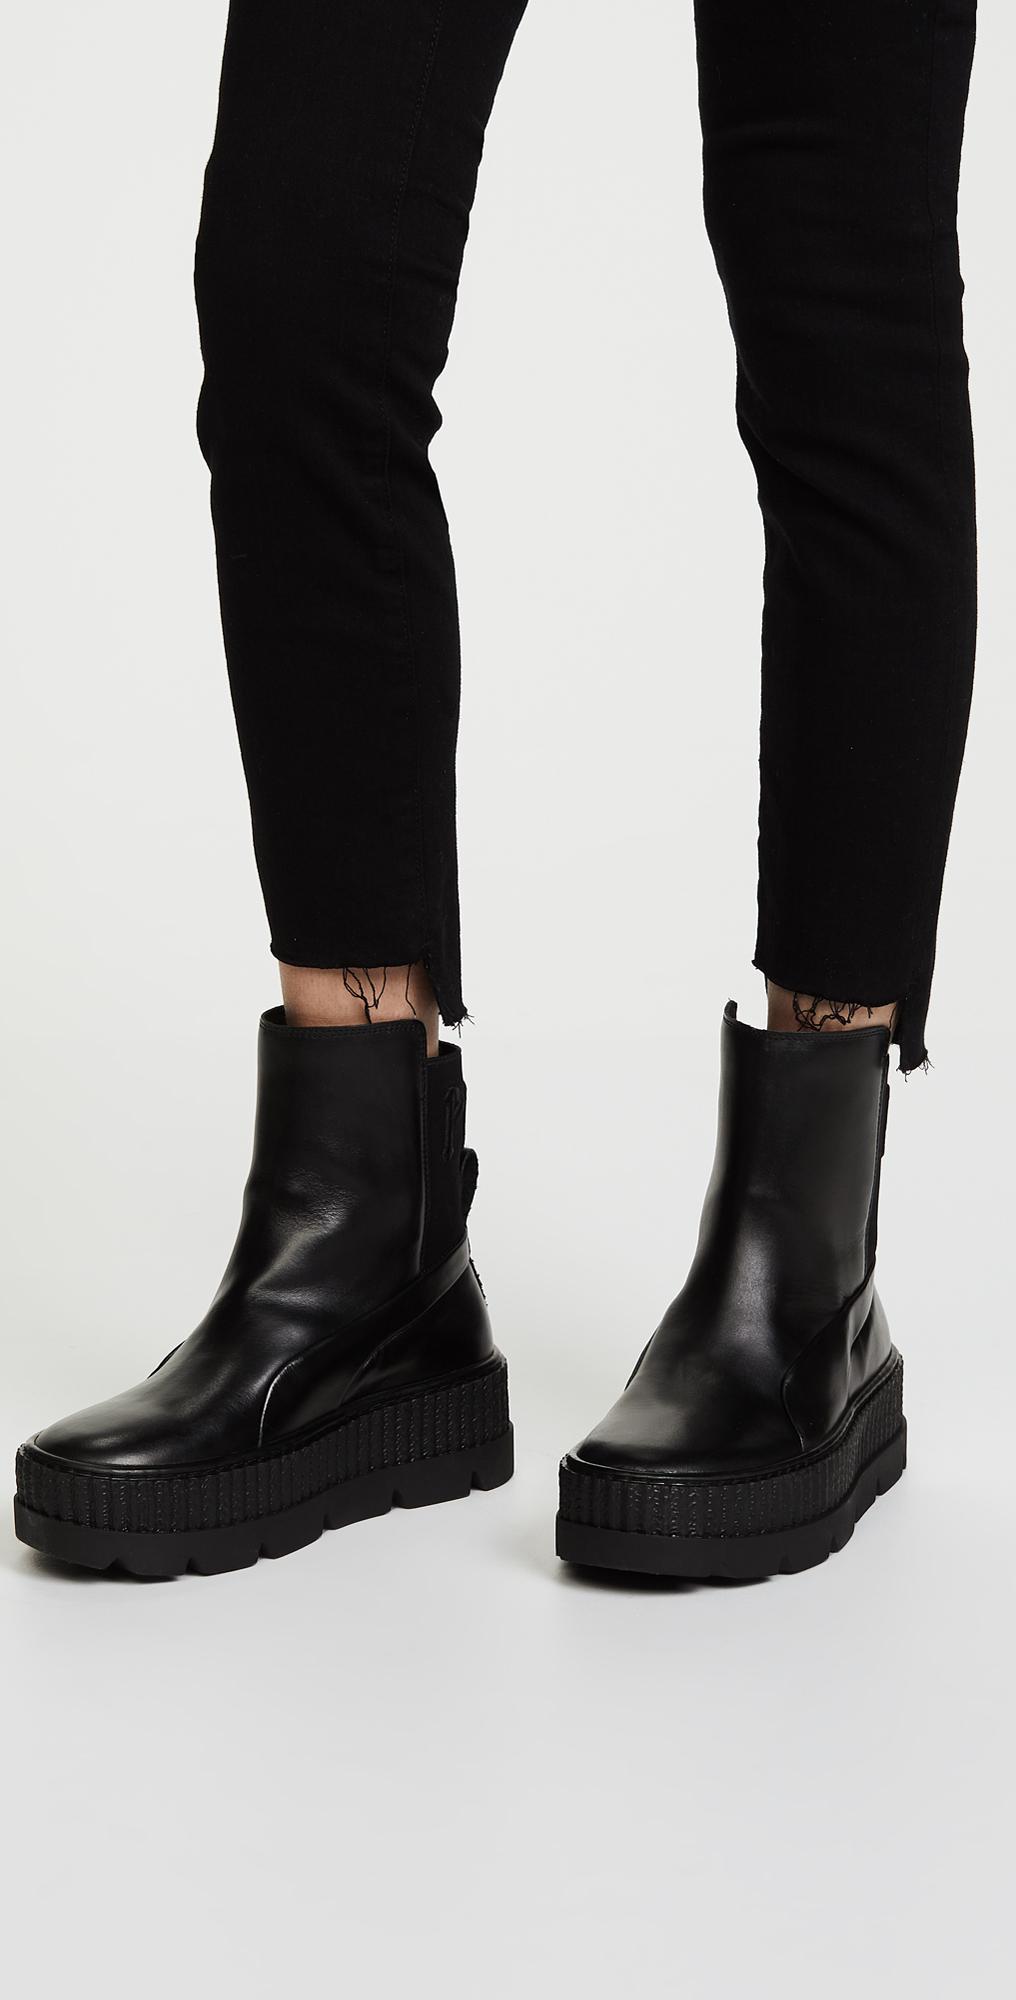 c4f447d4dd71 PUMA FENTY x PUMA Chelsea Sneaker Boots